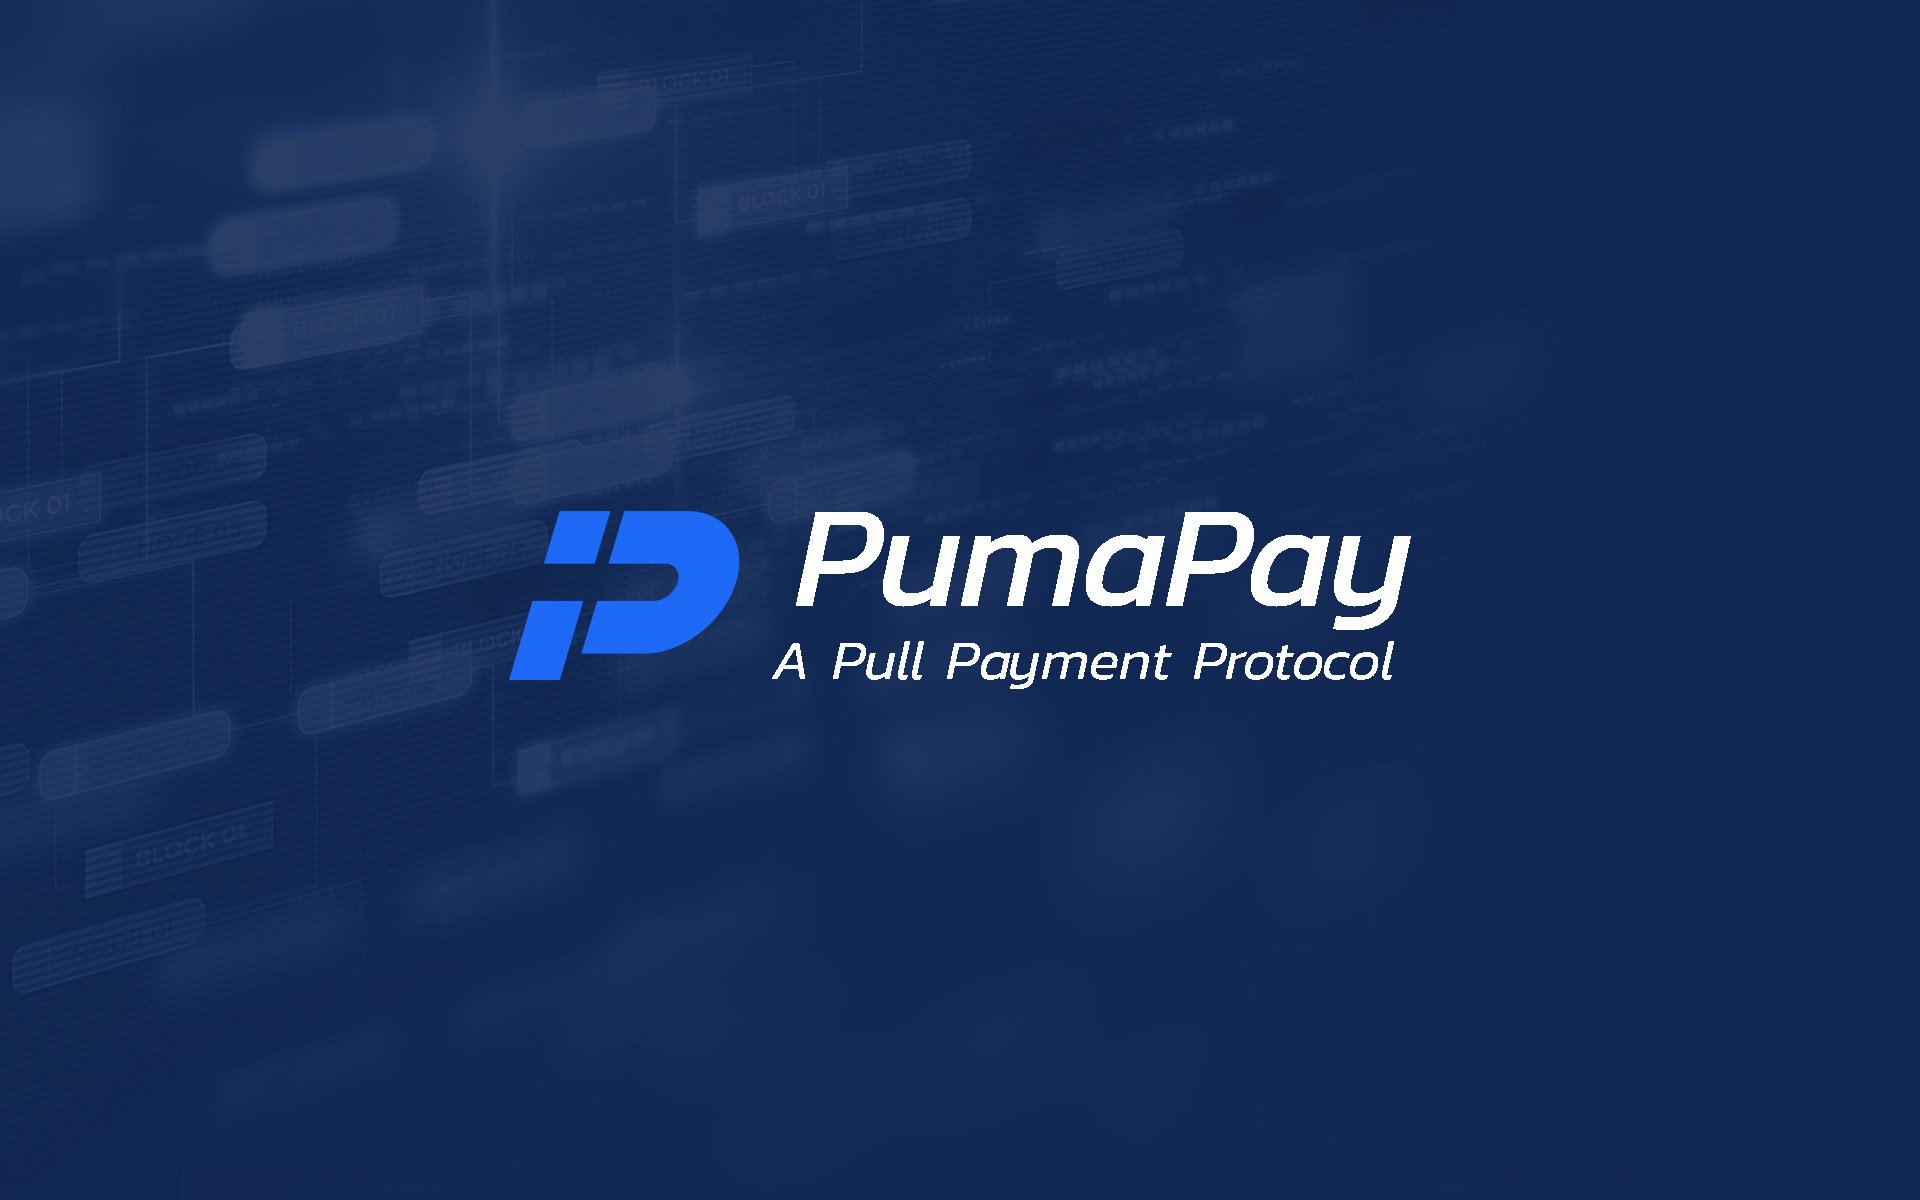 PumaPay Aims To Tackle Credit Card Fraud, Protect Merchants And Save Consumers Money